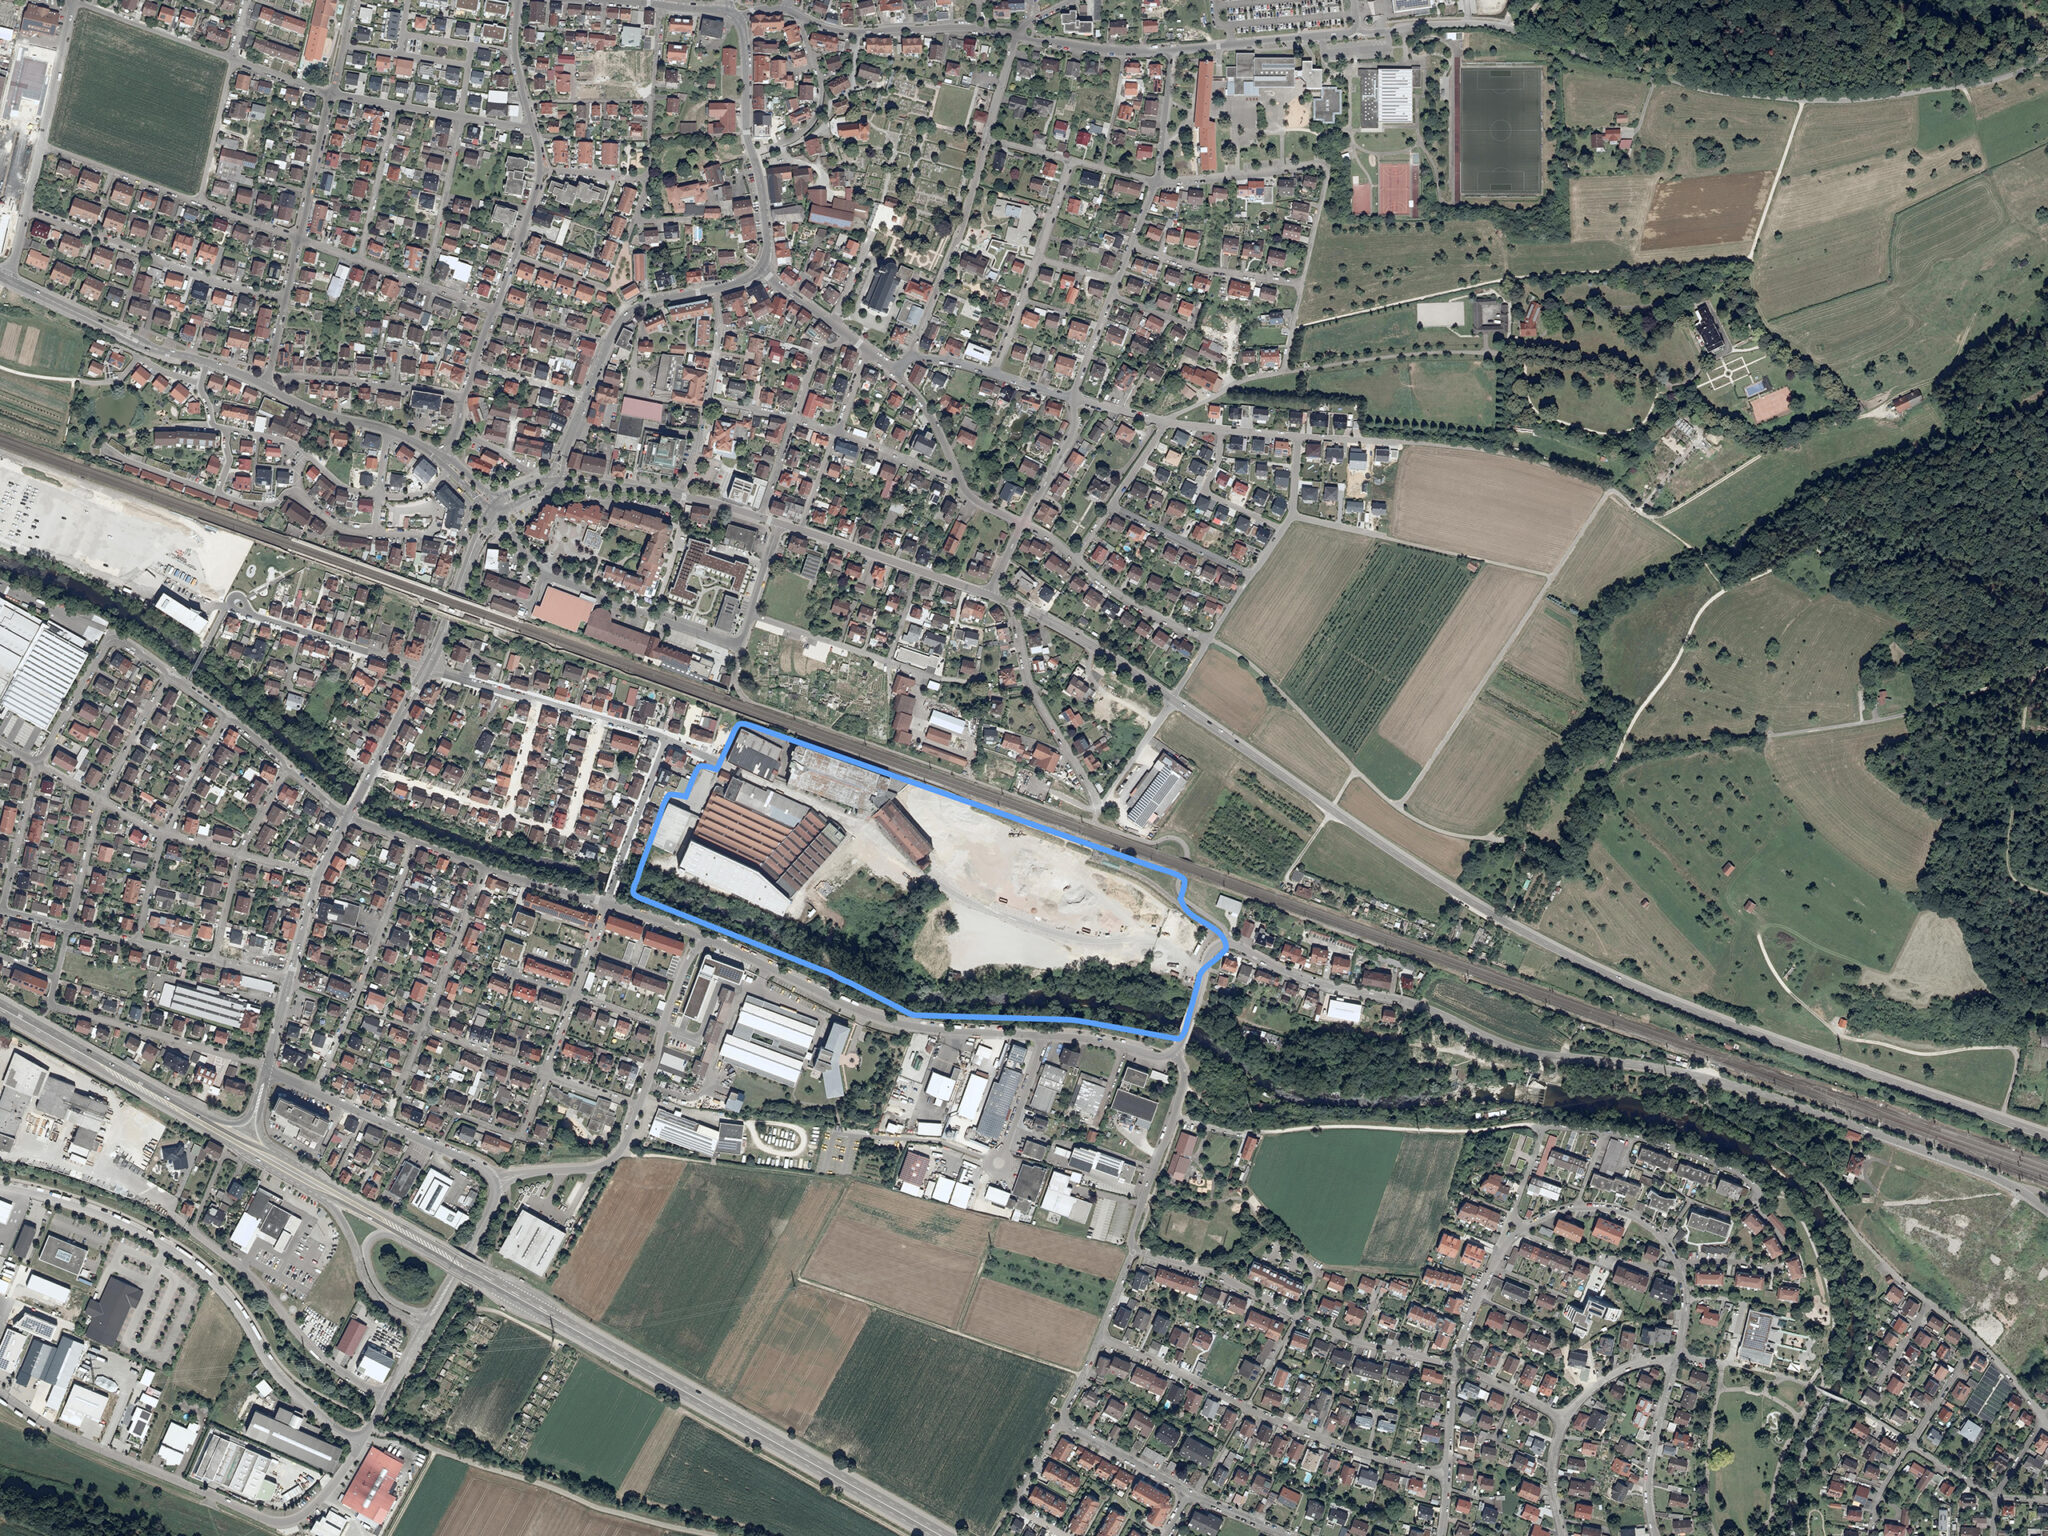 Luftbild Quartier Mühlkanal Salach